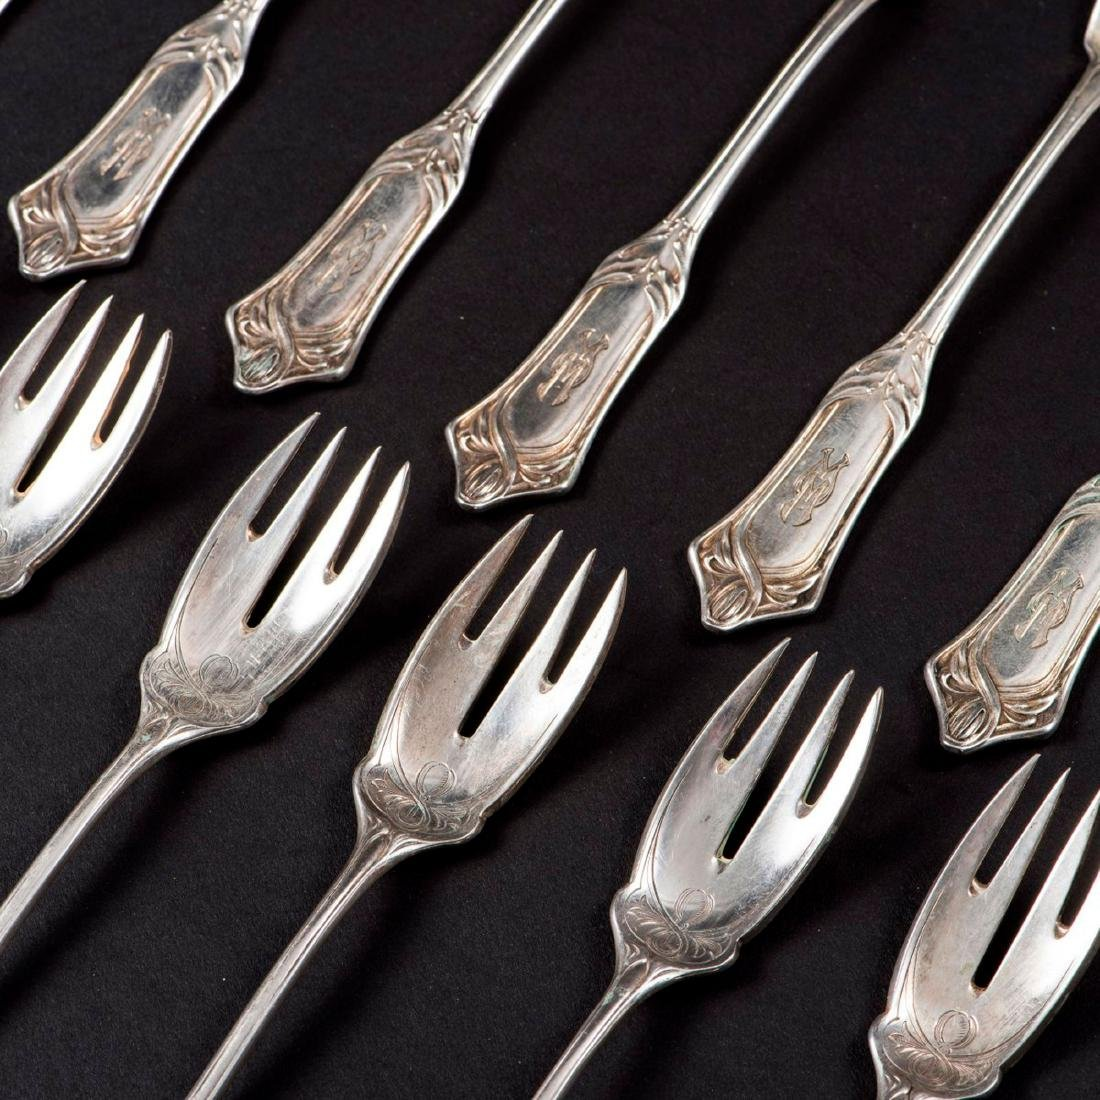 '2651' fish cutlery, 1900 - 2